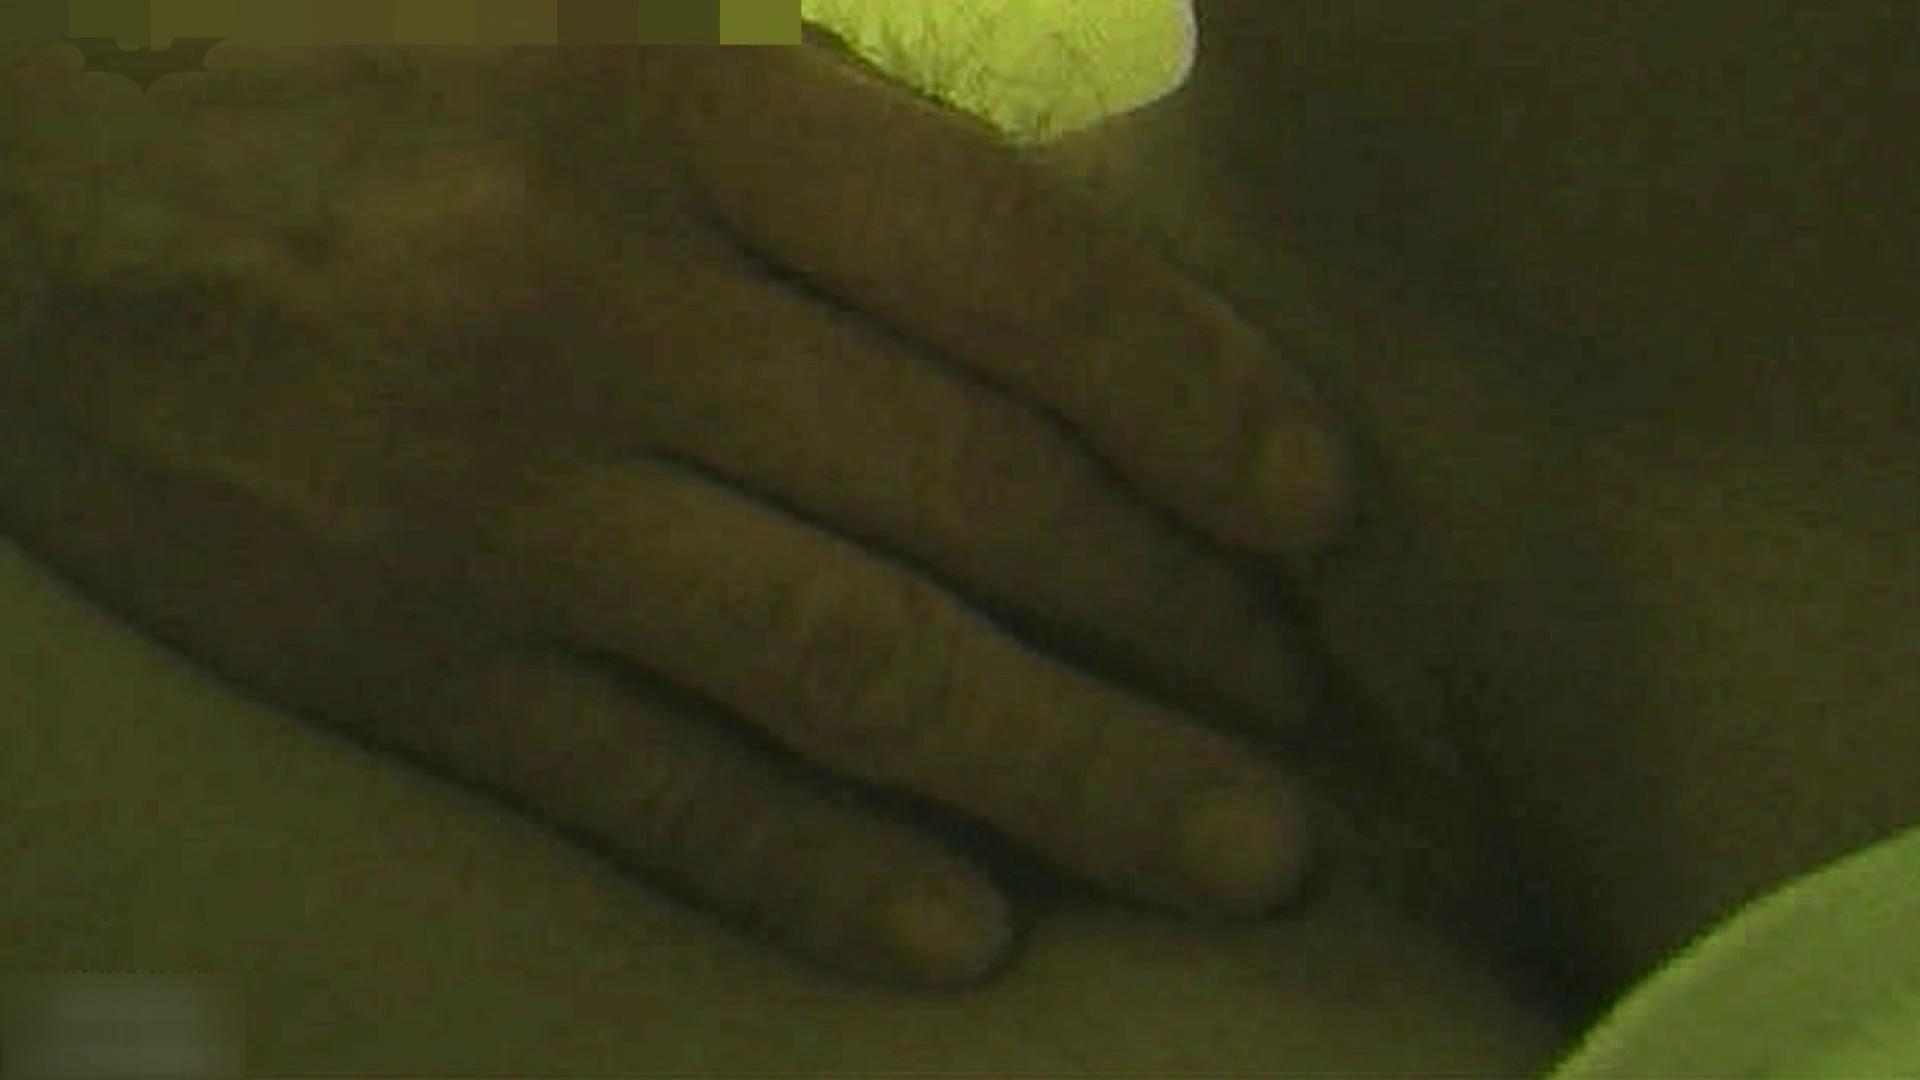 Part2 合コンで知り合った ありさちゃん Vol.02 マンコ丸見え編 丸見え われめAV動画紹介 79連発 50